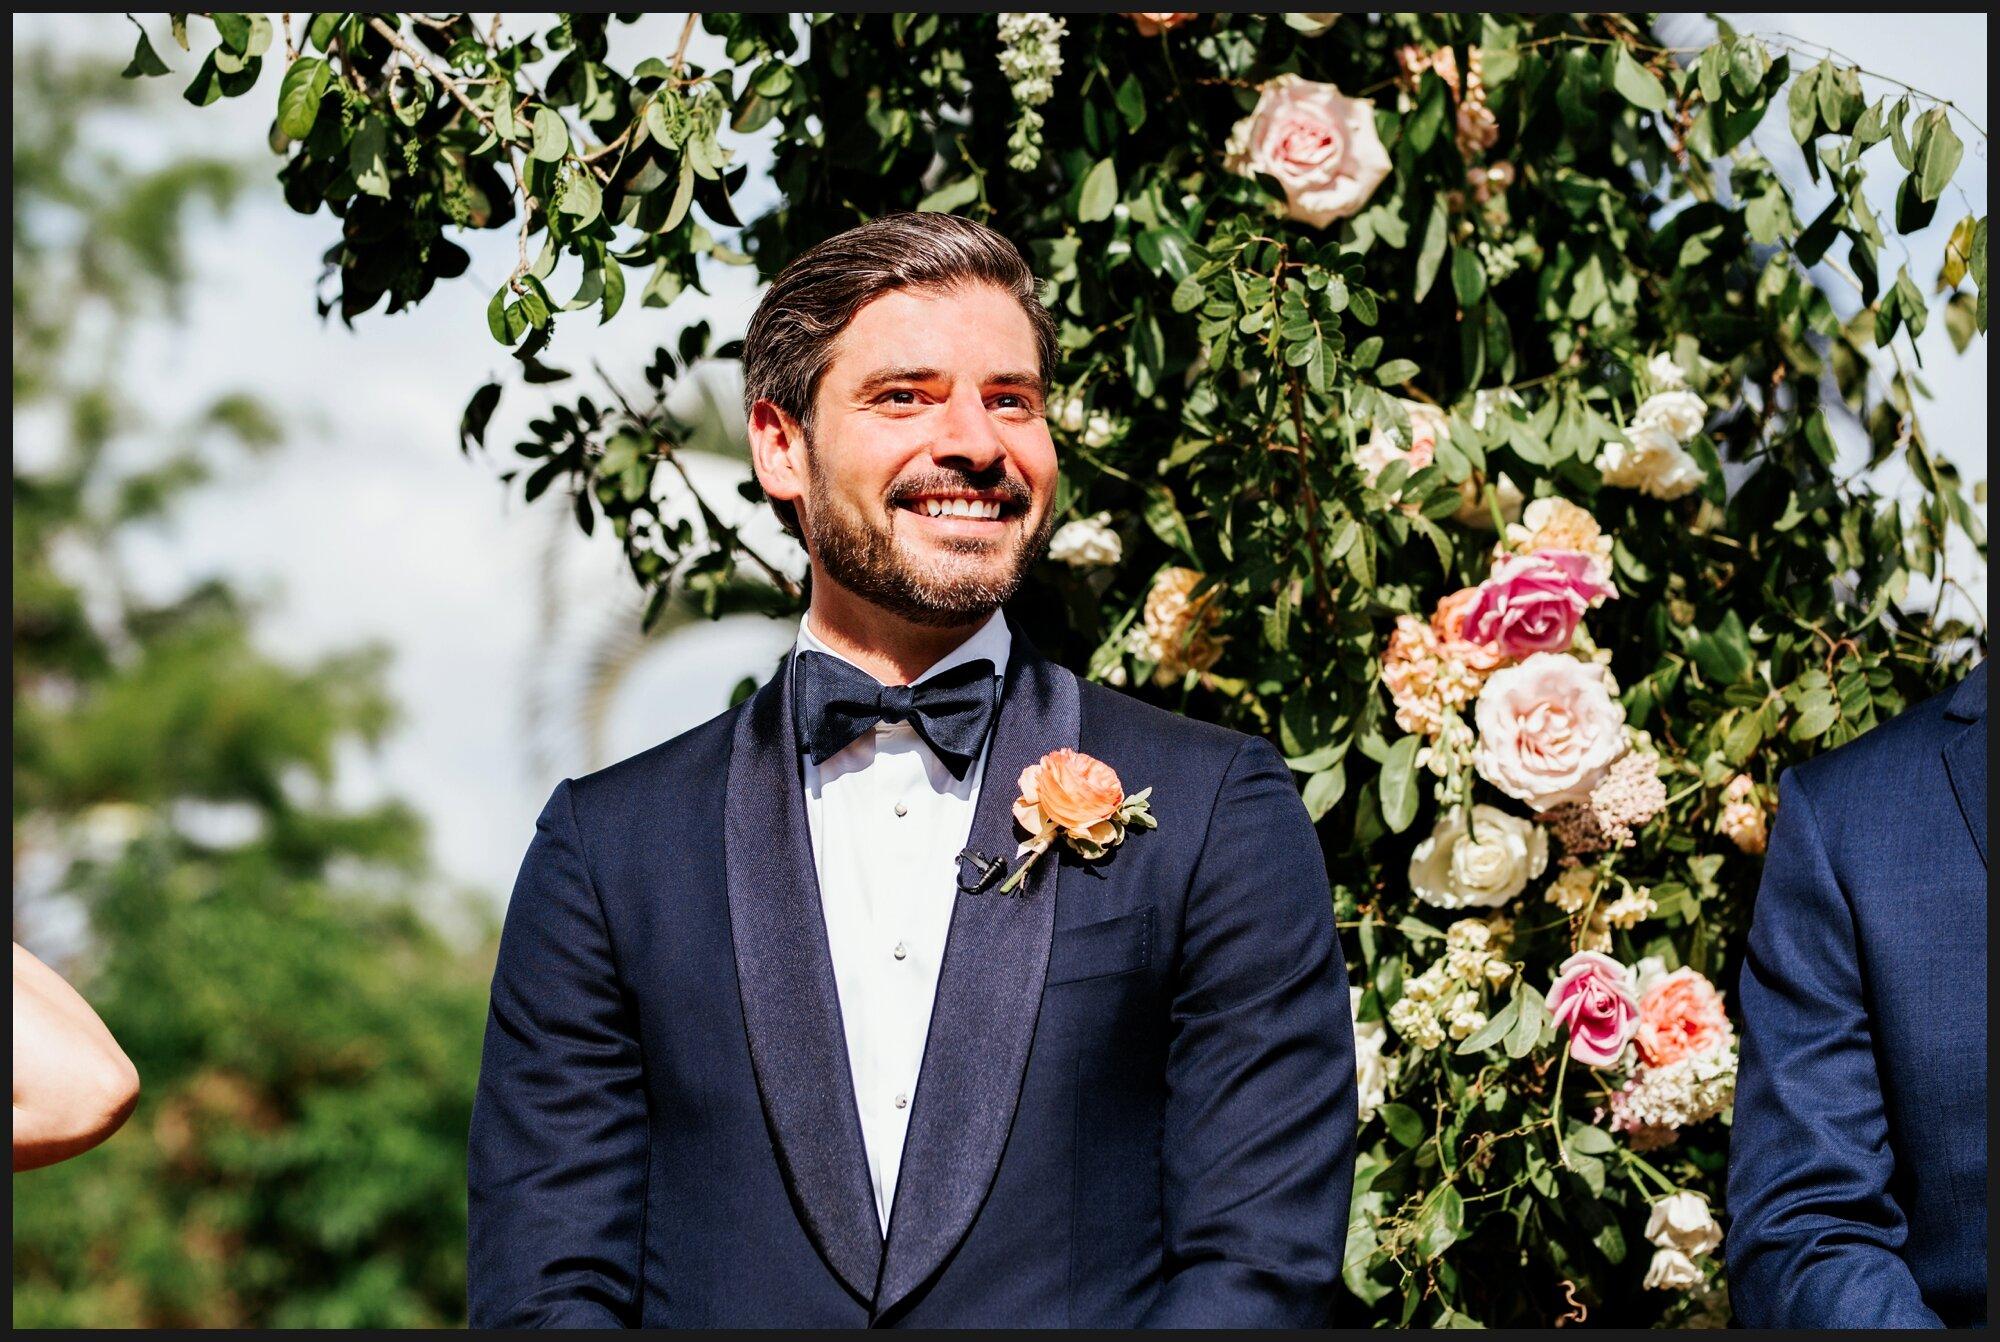 Orlando-Wedding-Photographer-destination-wedding-photographer-florida-wedding-photographer-hawaii-wedding-photographer_0752.jpg